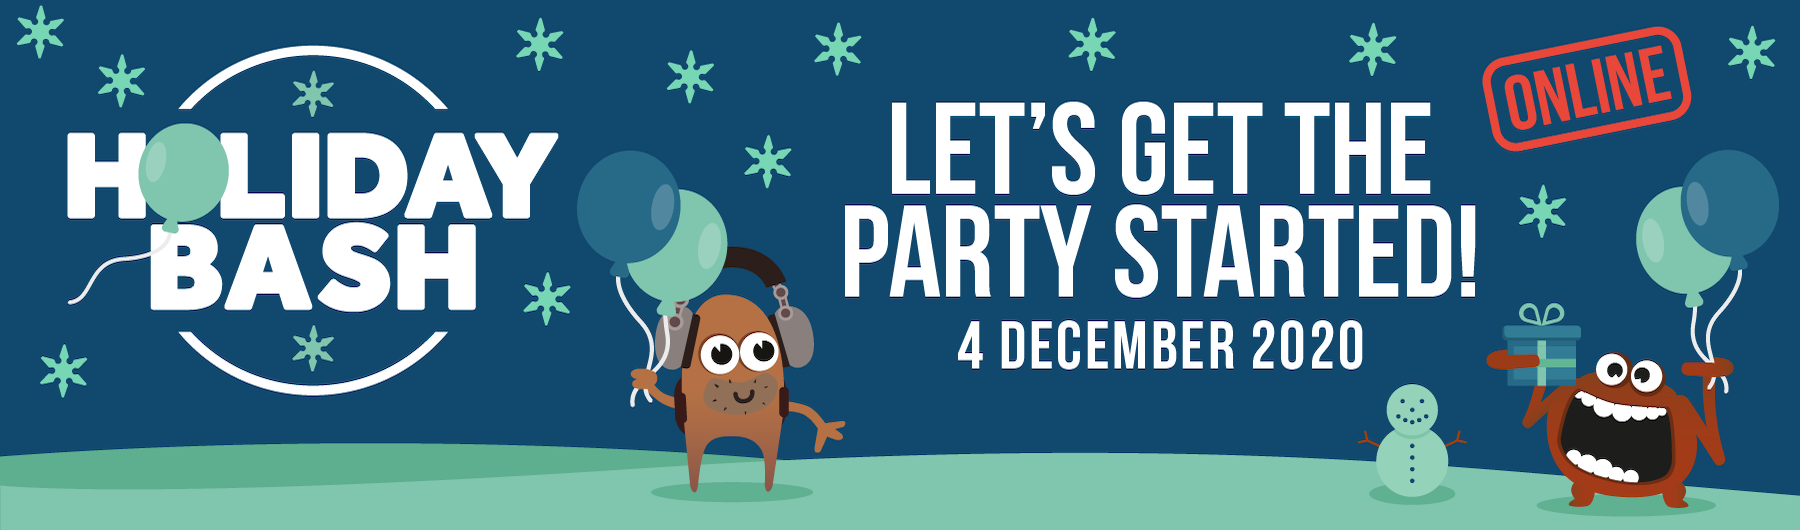 HolidayBash Sponsorship 2020